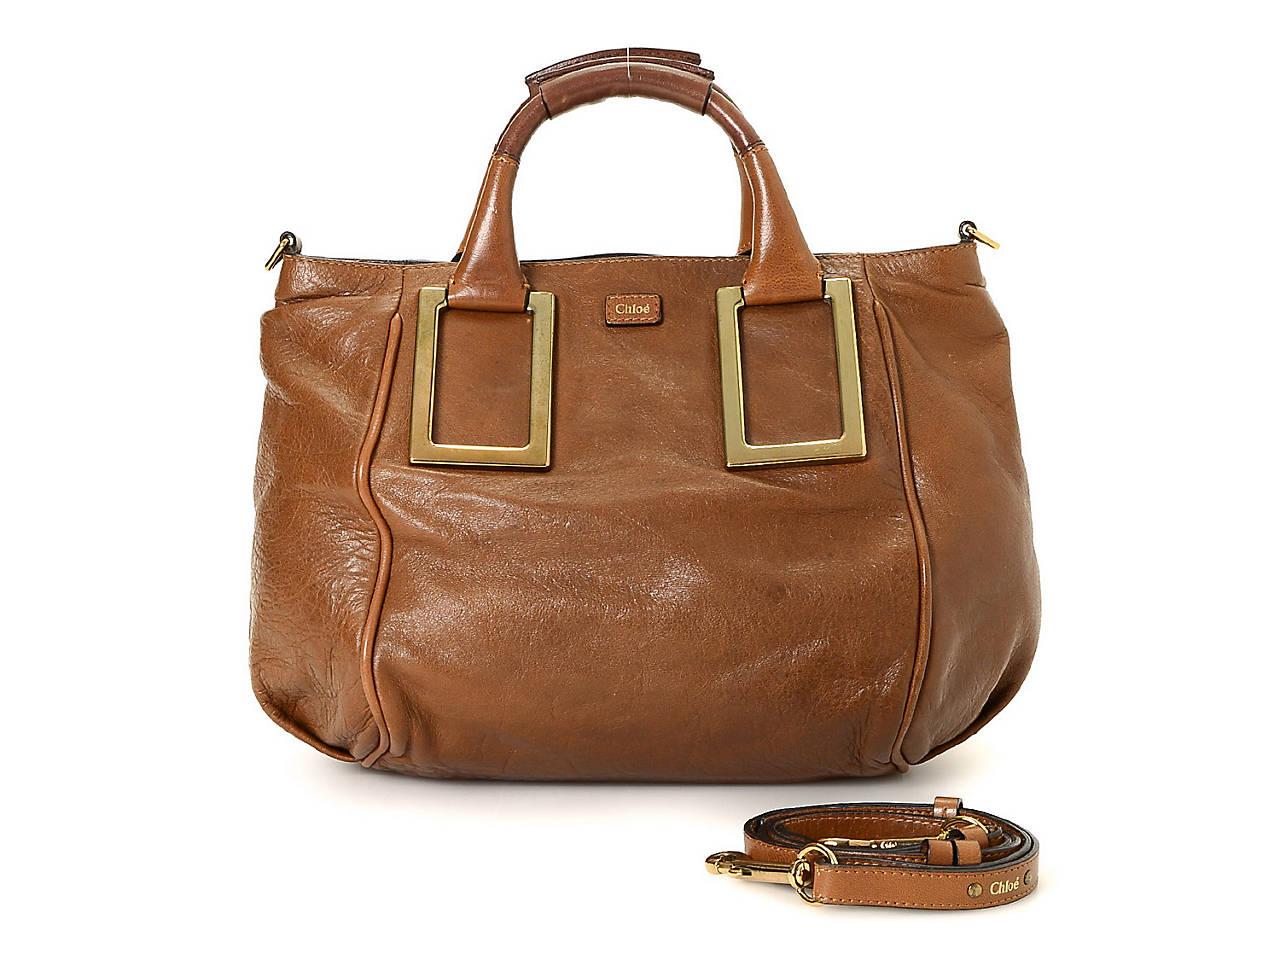 bca7527cad Chloe Vintage Luxury Ethel Leather Satchel Women S Handbags. The Chloe  Paddington Bag